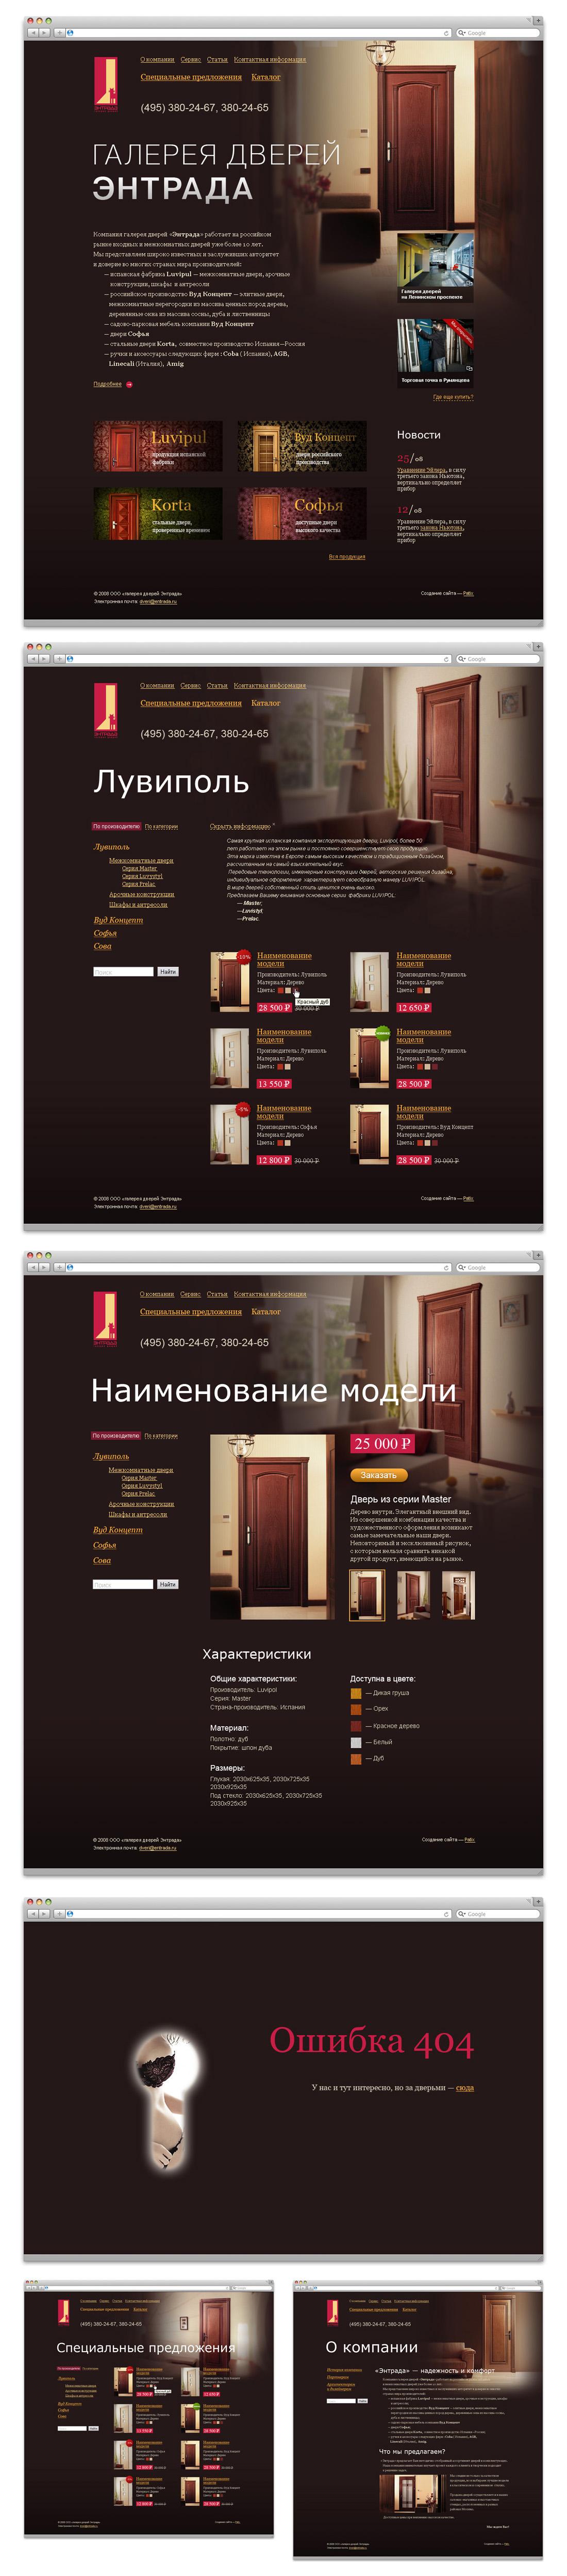 Галерея дверей «Энтрада»